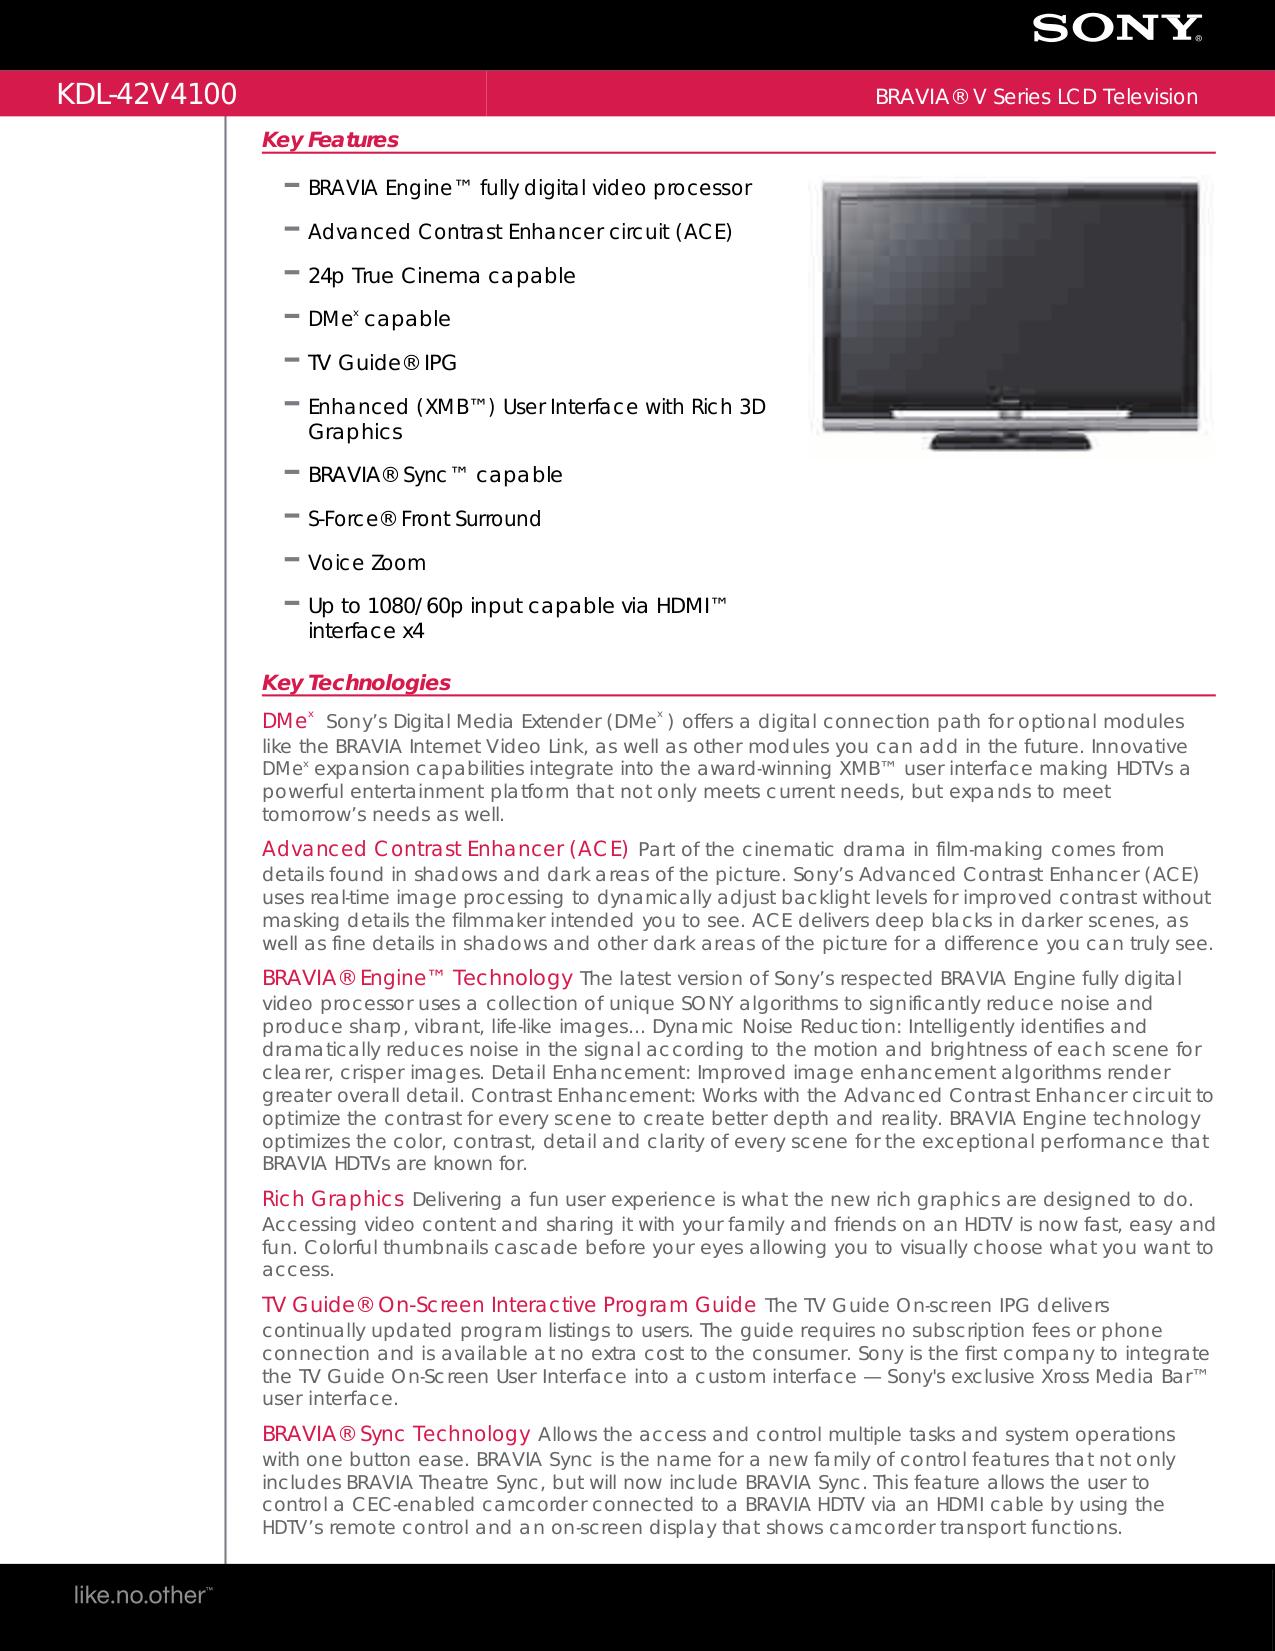 download free pdf for sony bravia kdl 42v4100 tv manual rh umlib com Sony KDL 42V4100 Power Sony BRAVIA 42 Inch TV